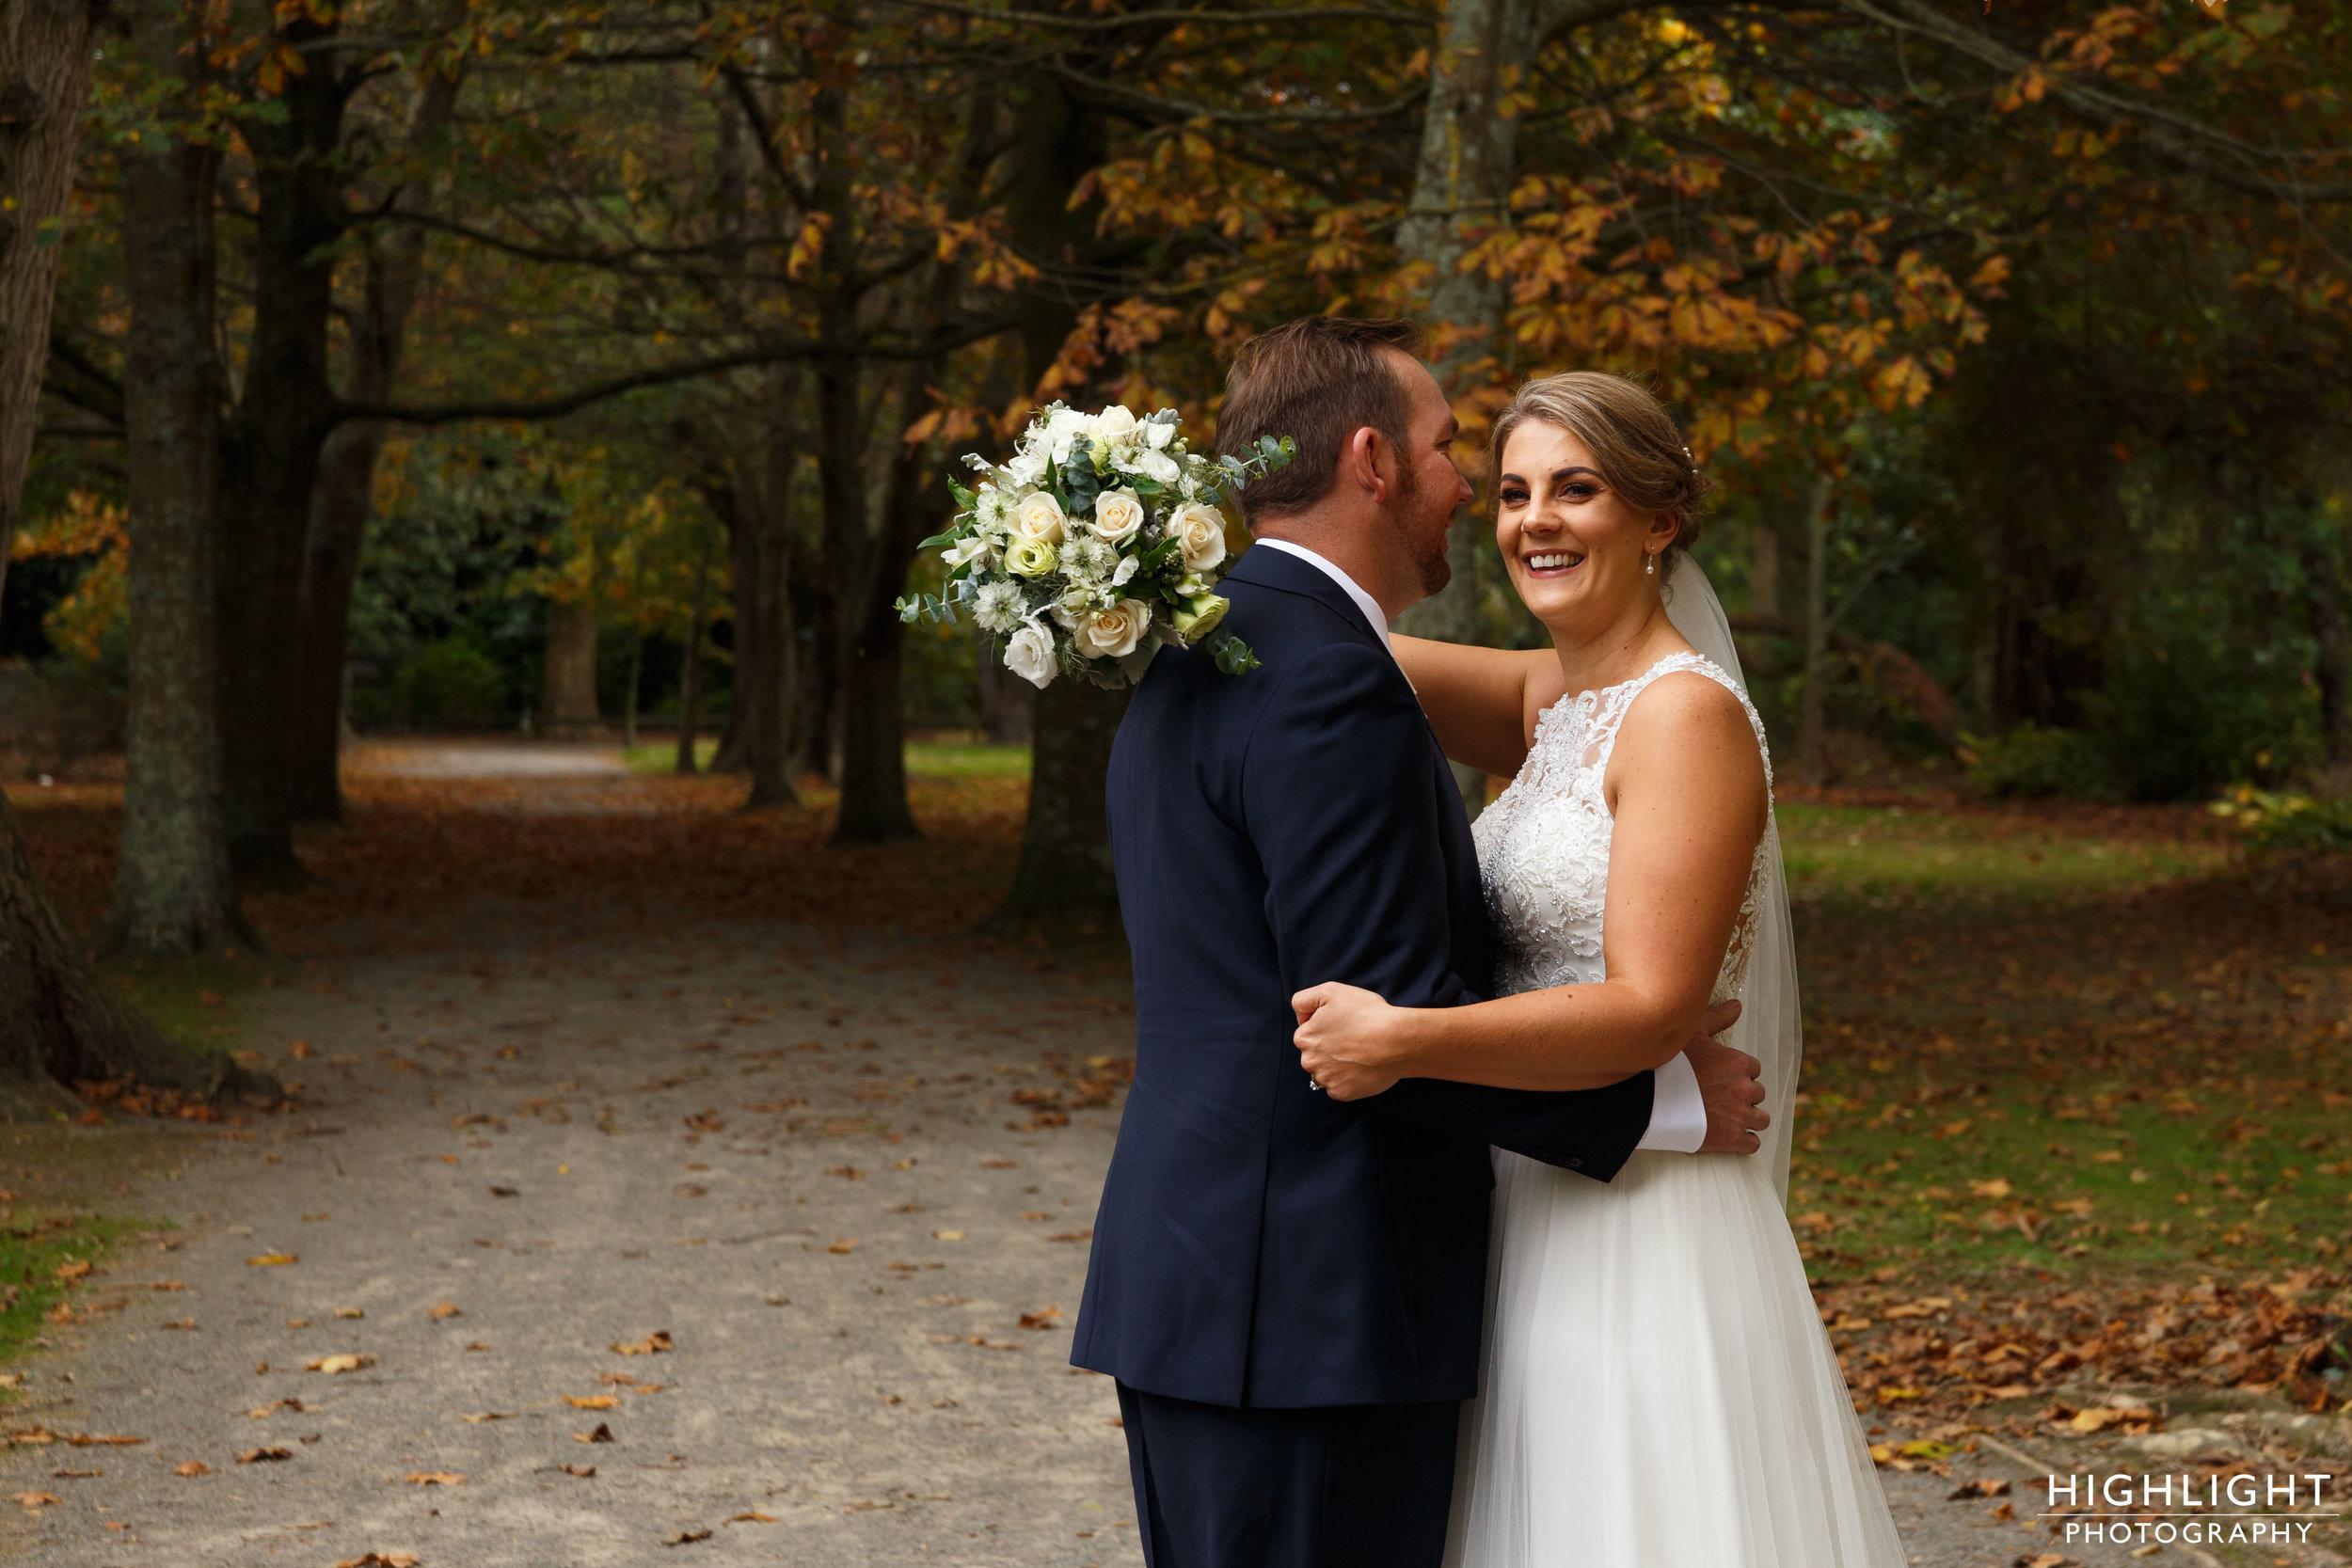 highlight-wedding-photography-palmerston-north-new-zealand-orlando-country-club-wedding-52.jpg